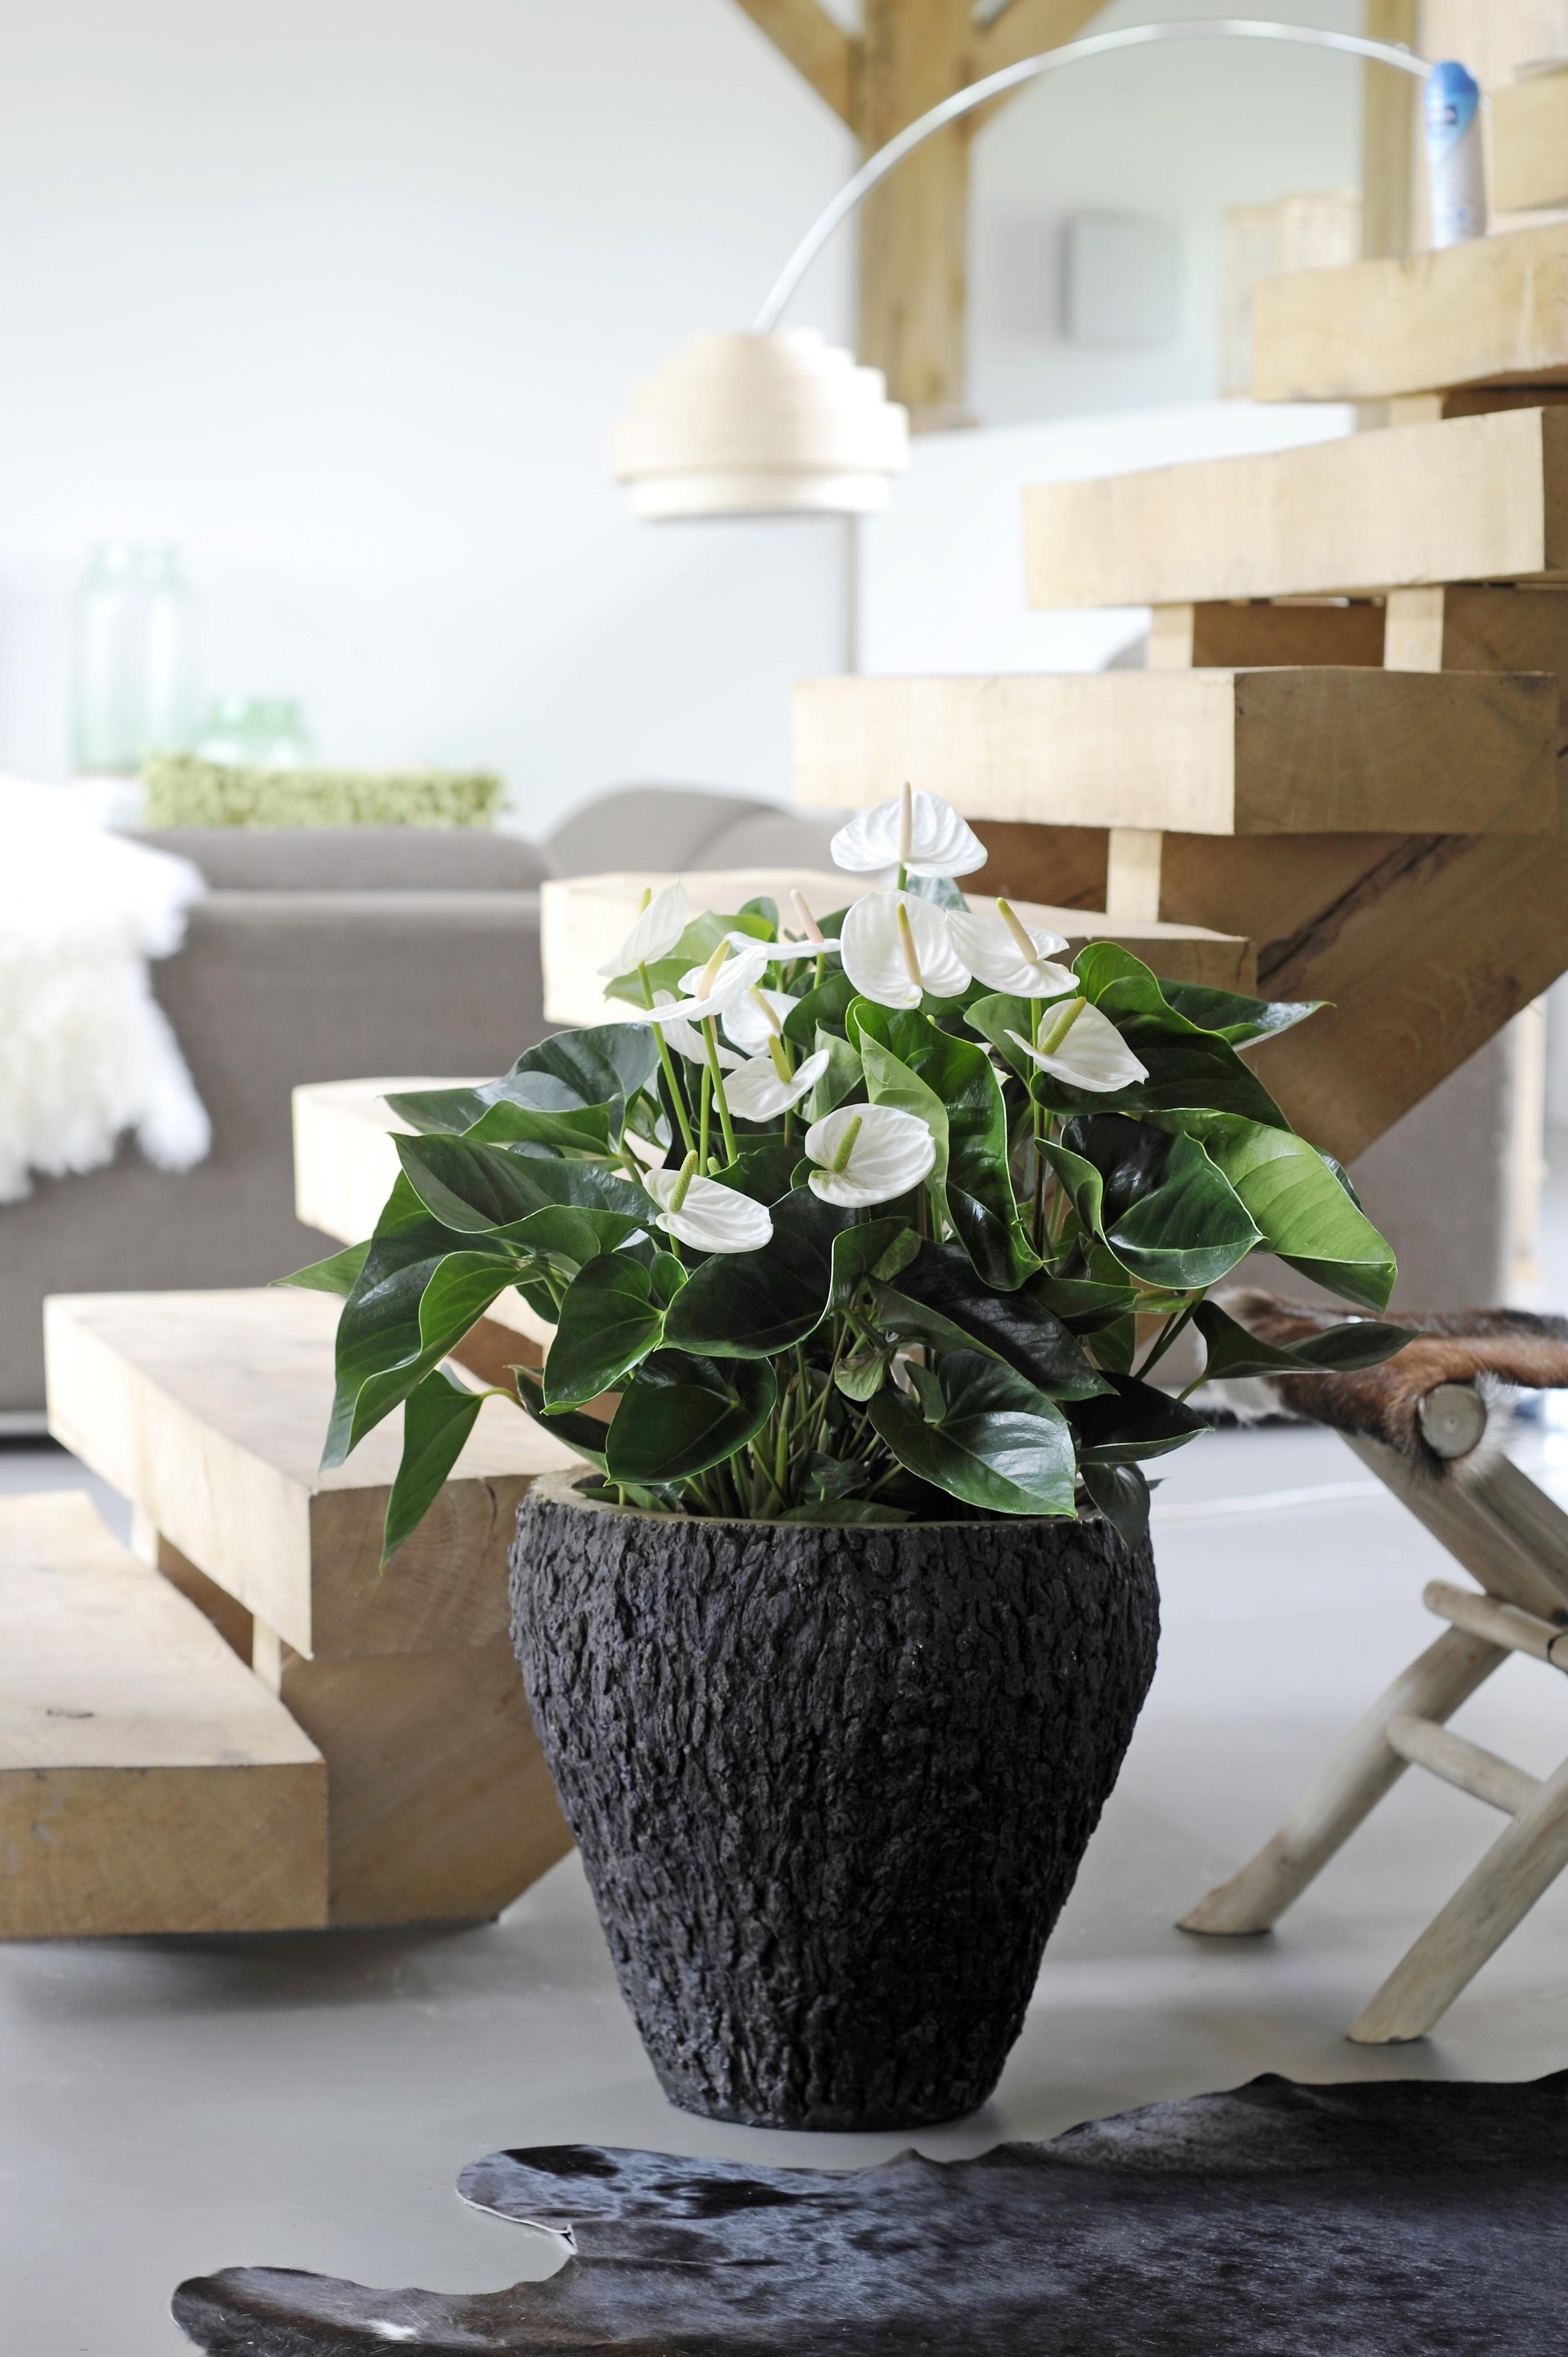 Good-bye Christmas tree, hello Anthurium pot plant ...